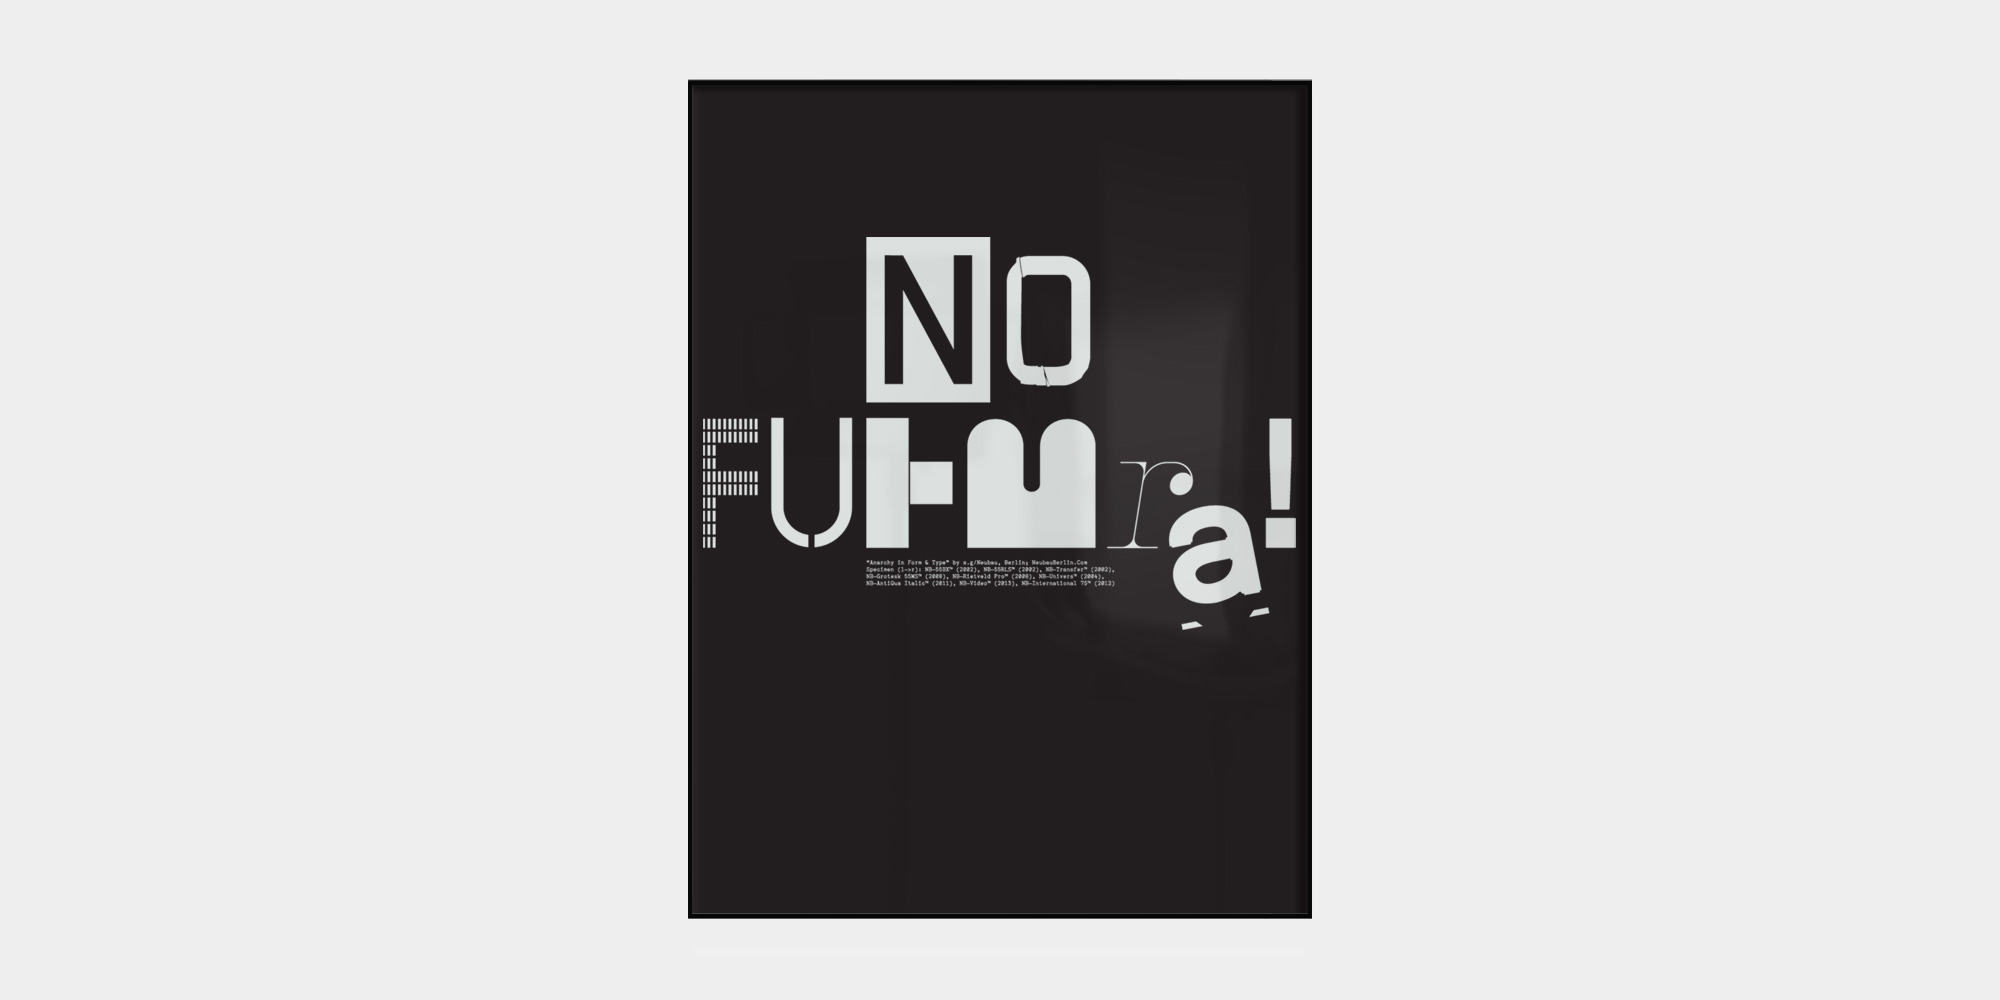 No-Futura-Poster